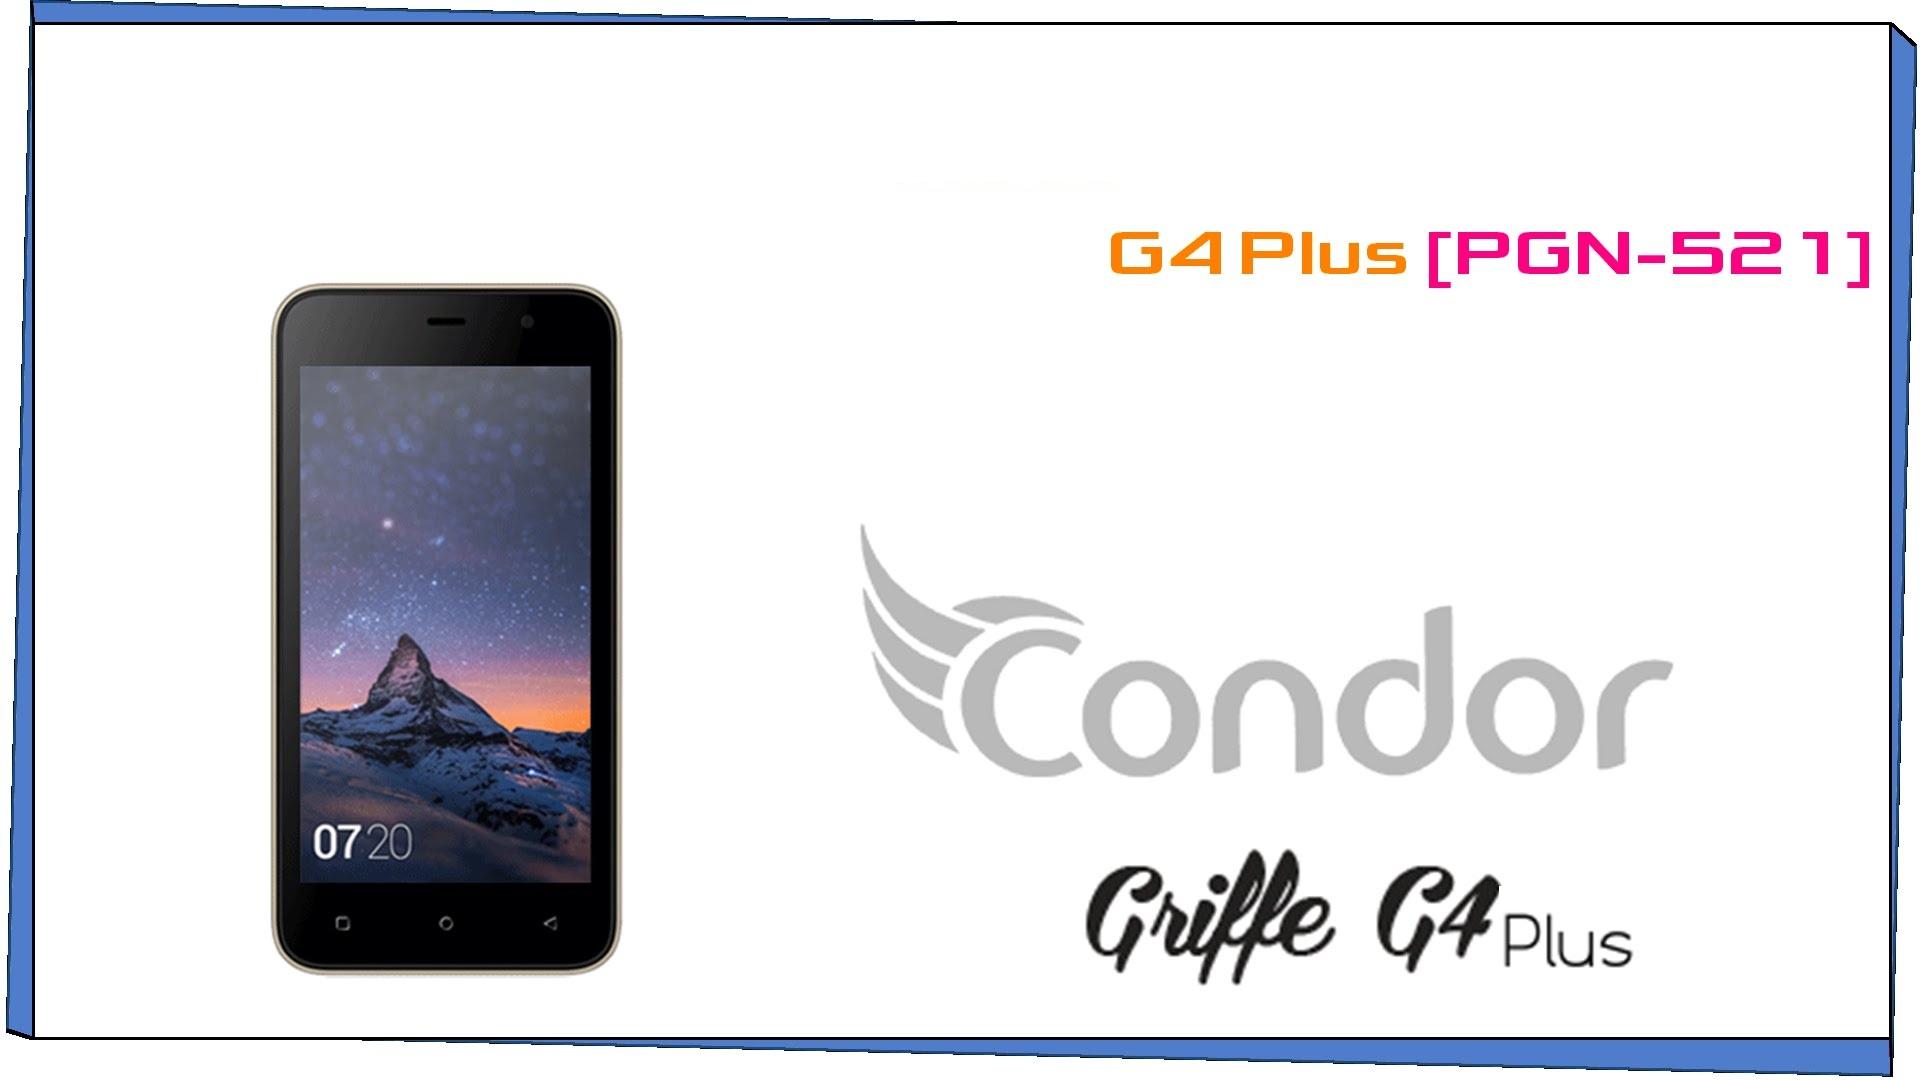 فلاشة Condor g4 plus pgn 521